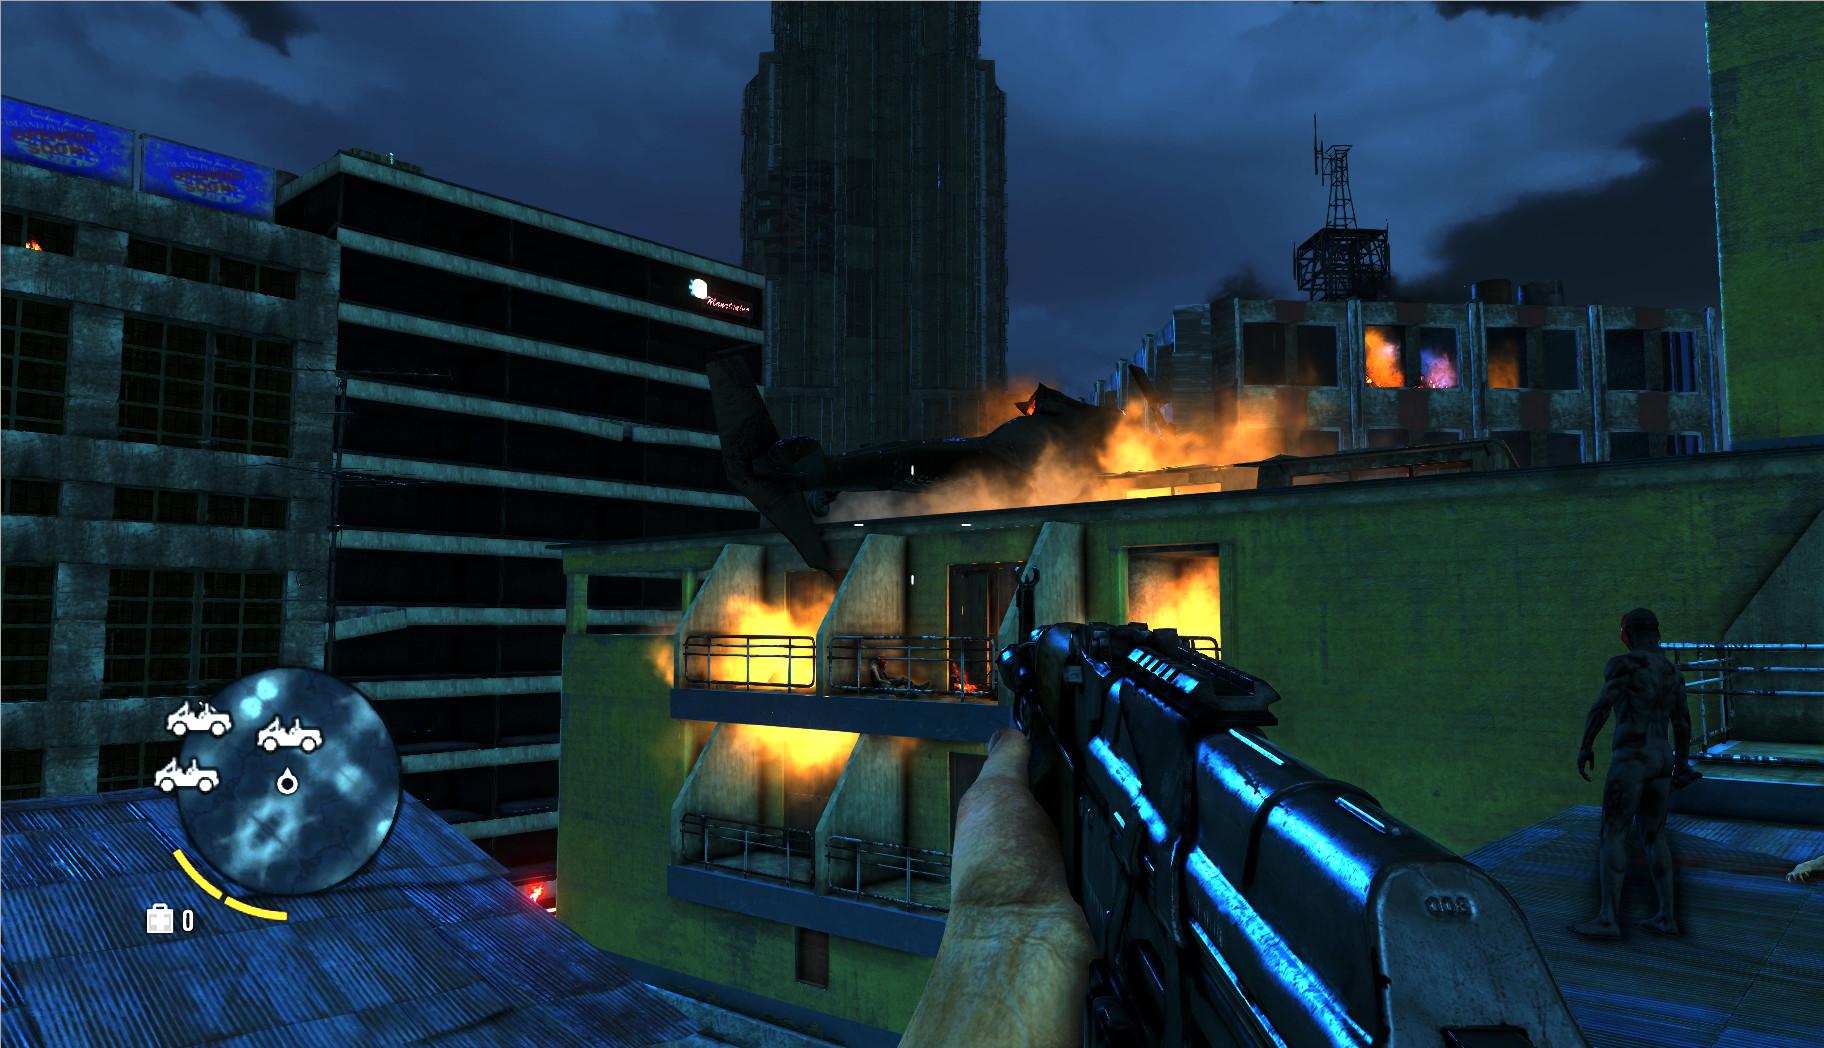 Far Cry ZDAY  Zombie Campaign announced news  DEAD CRY mod for Far Cry 3  Mod DB